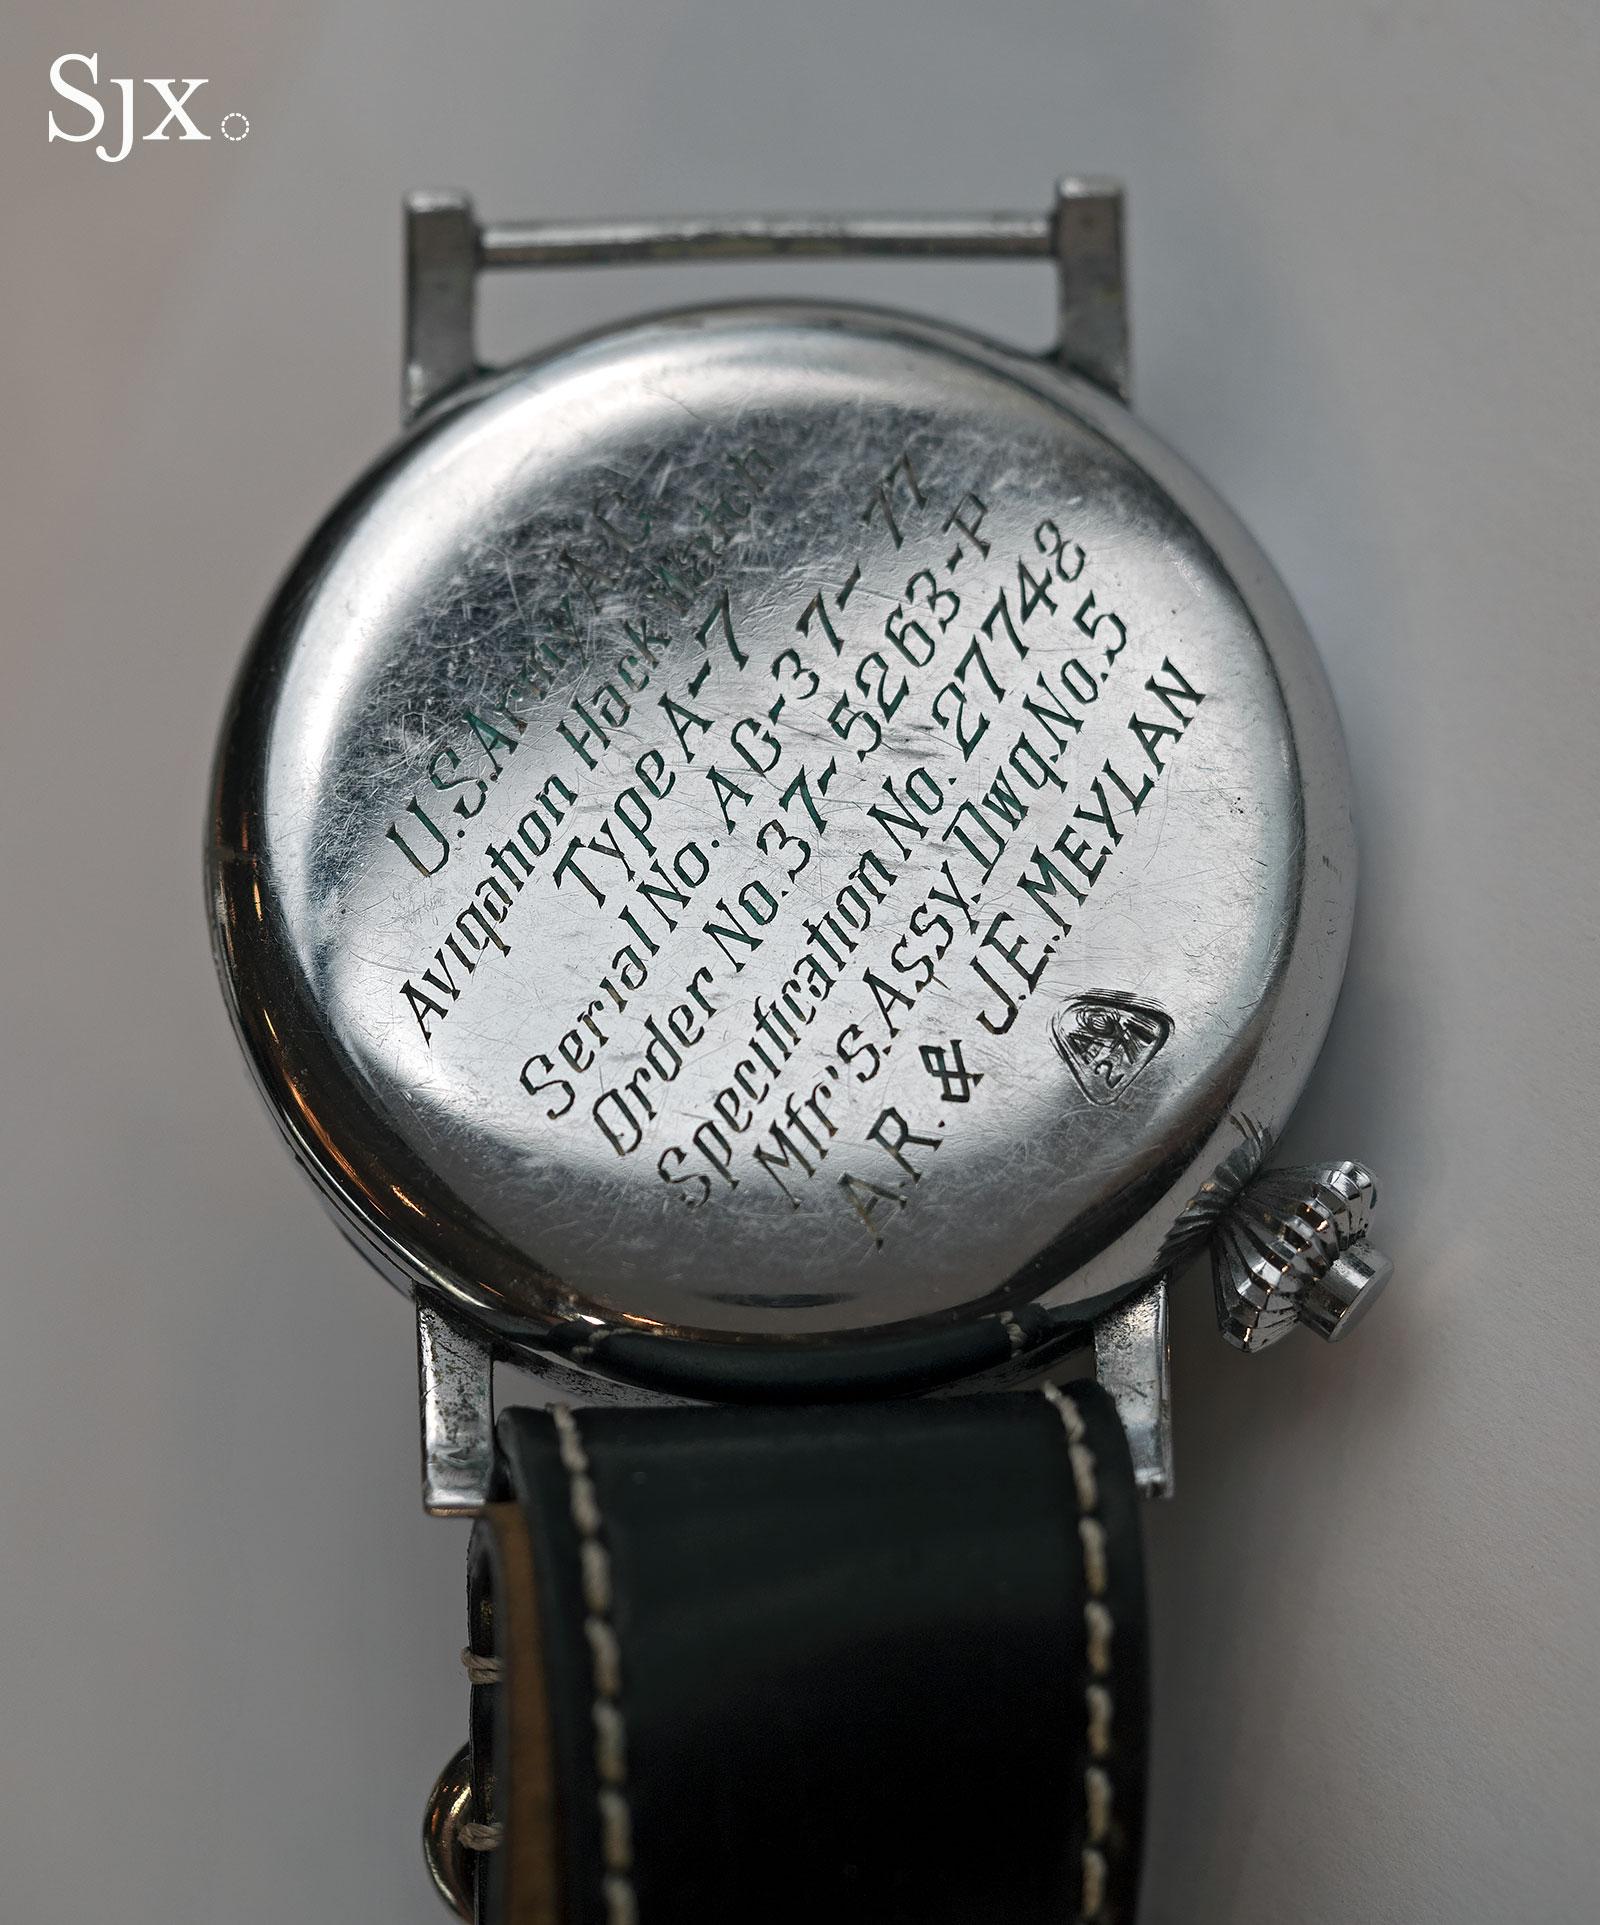 Meylan Type A-7 Chronograph Phillips 5